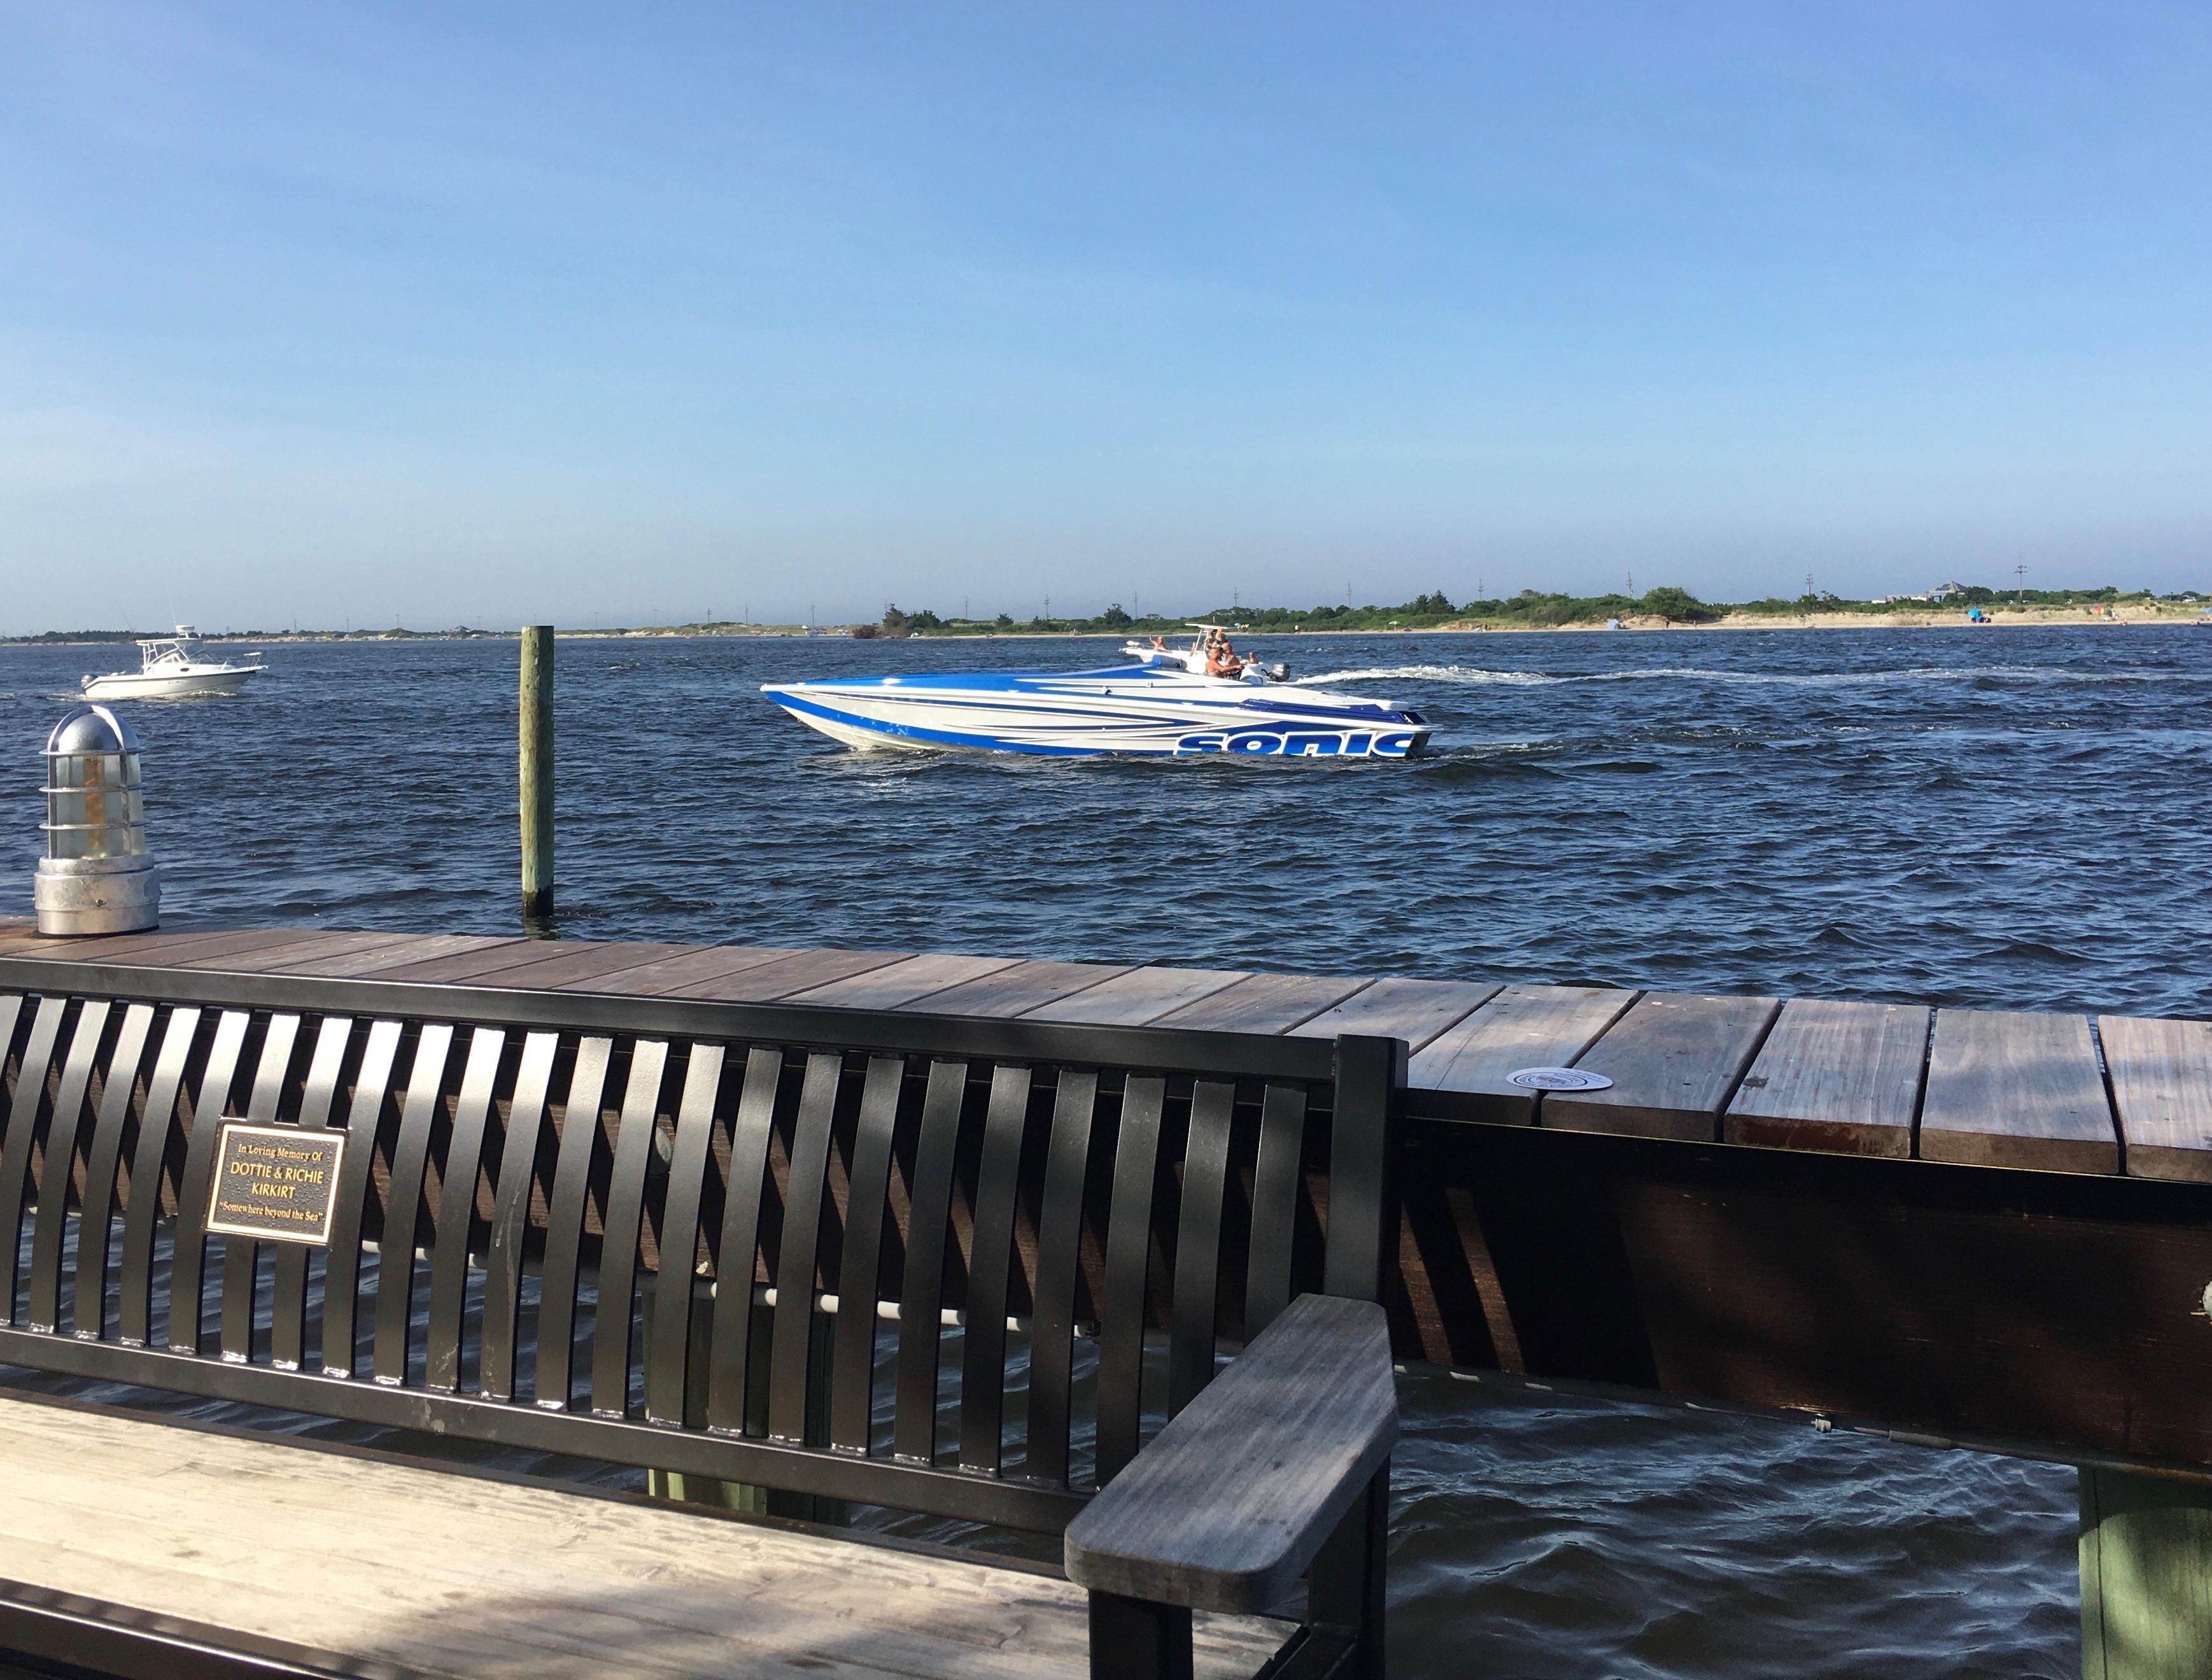 Wish I had a boat